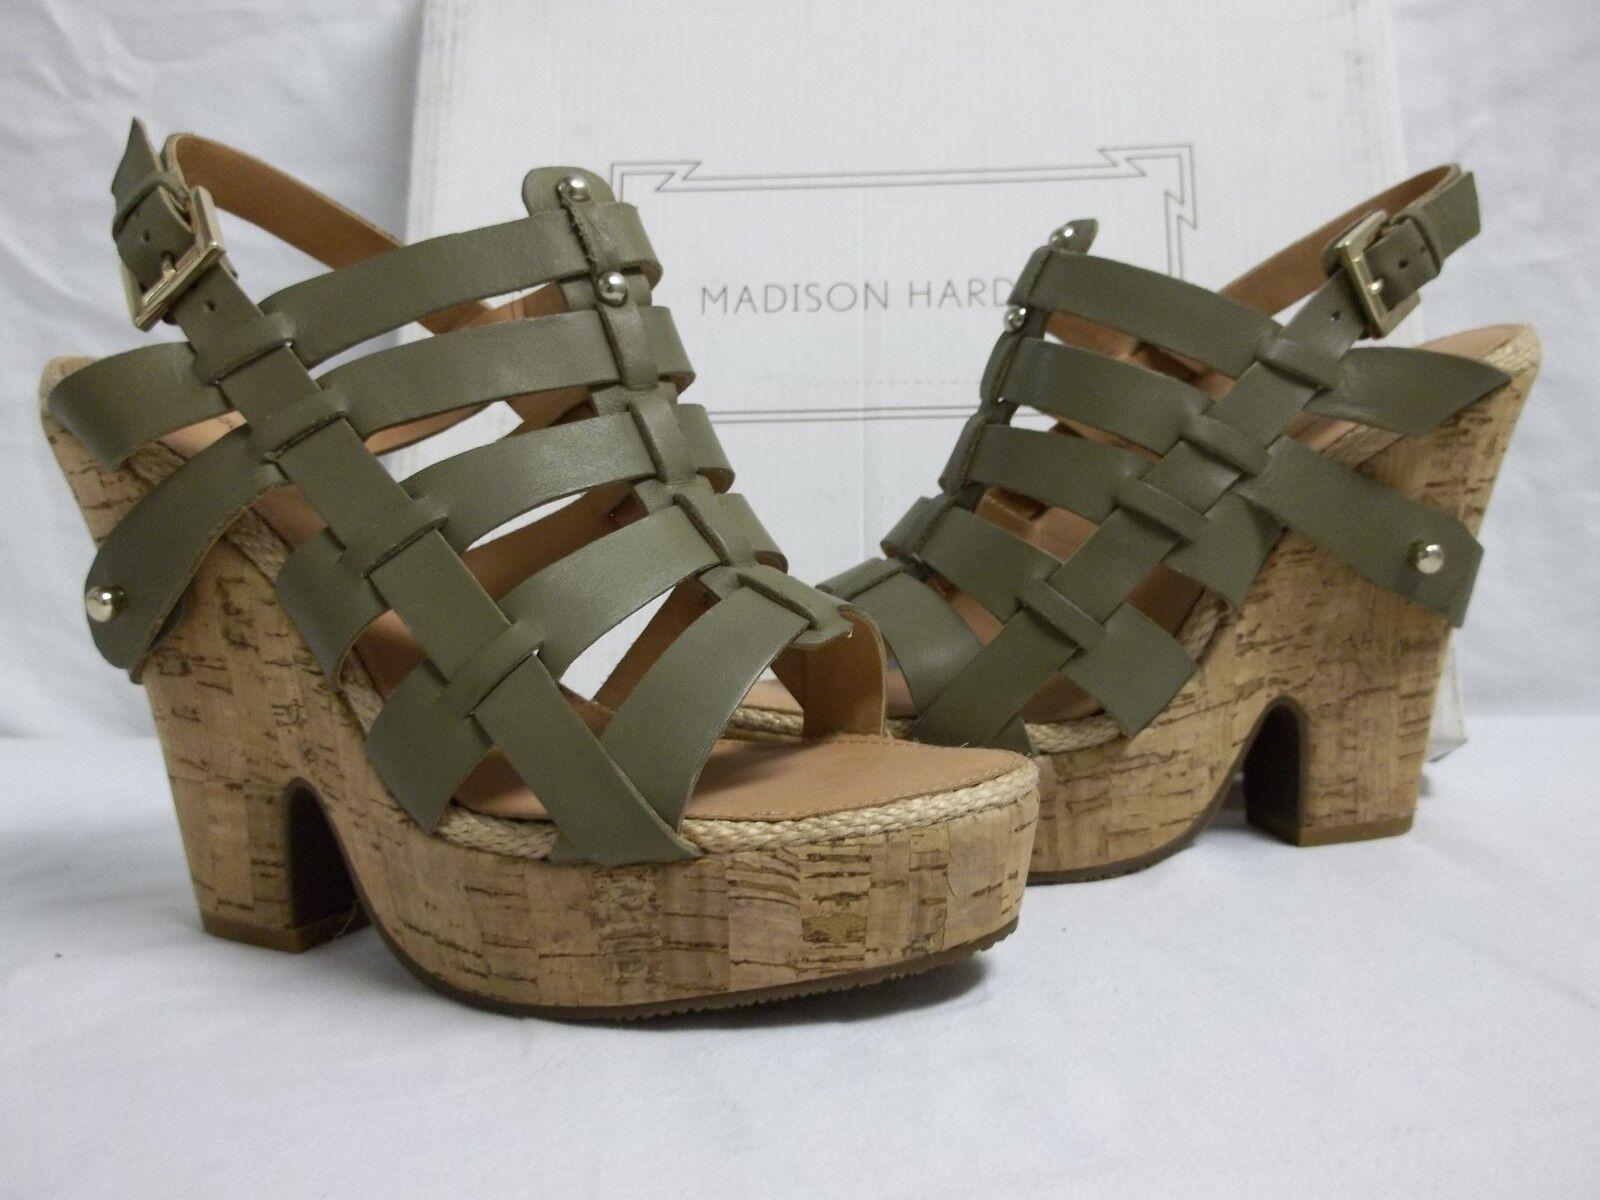 Madison Harding Größe 7 M Bobie Army Open Toe Heels NEU Damenschuhe Schuhes